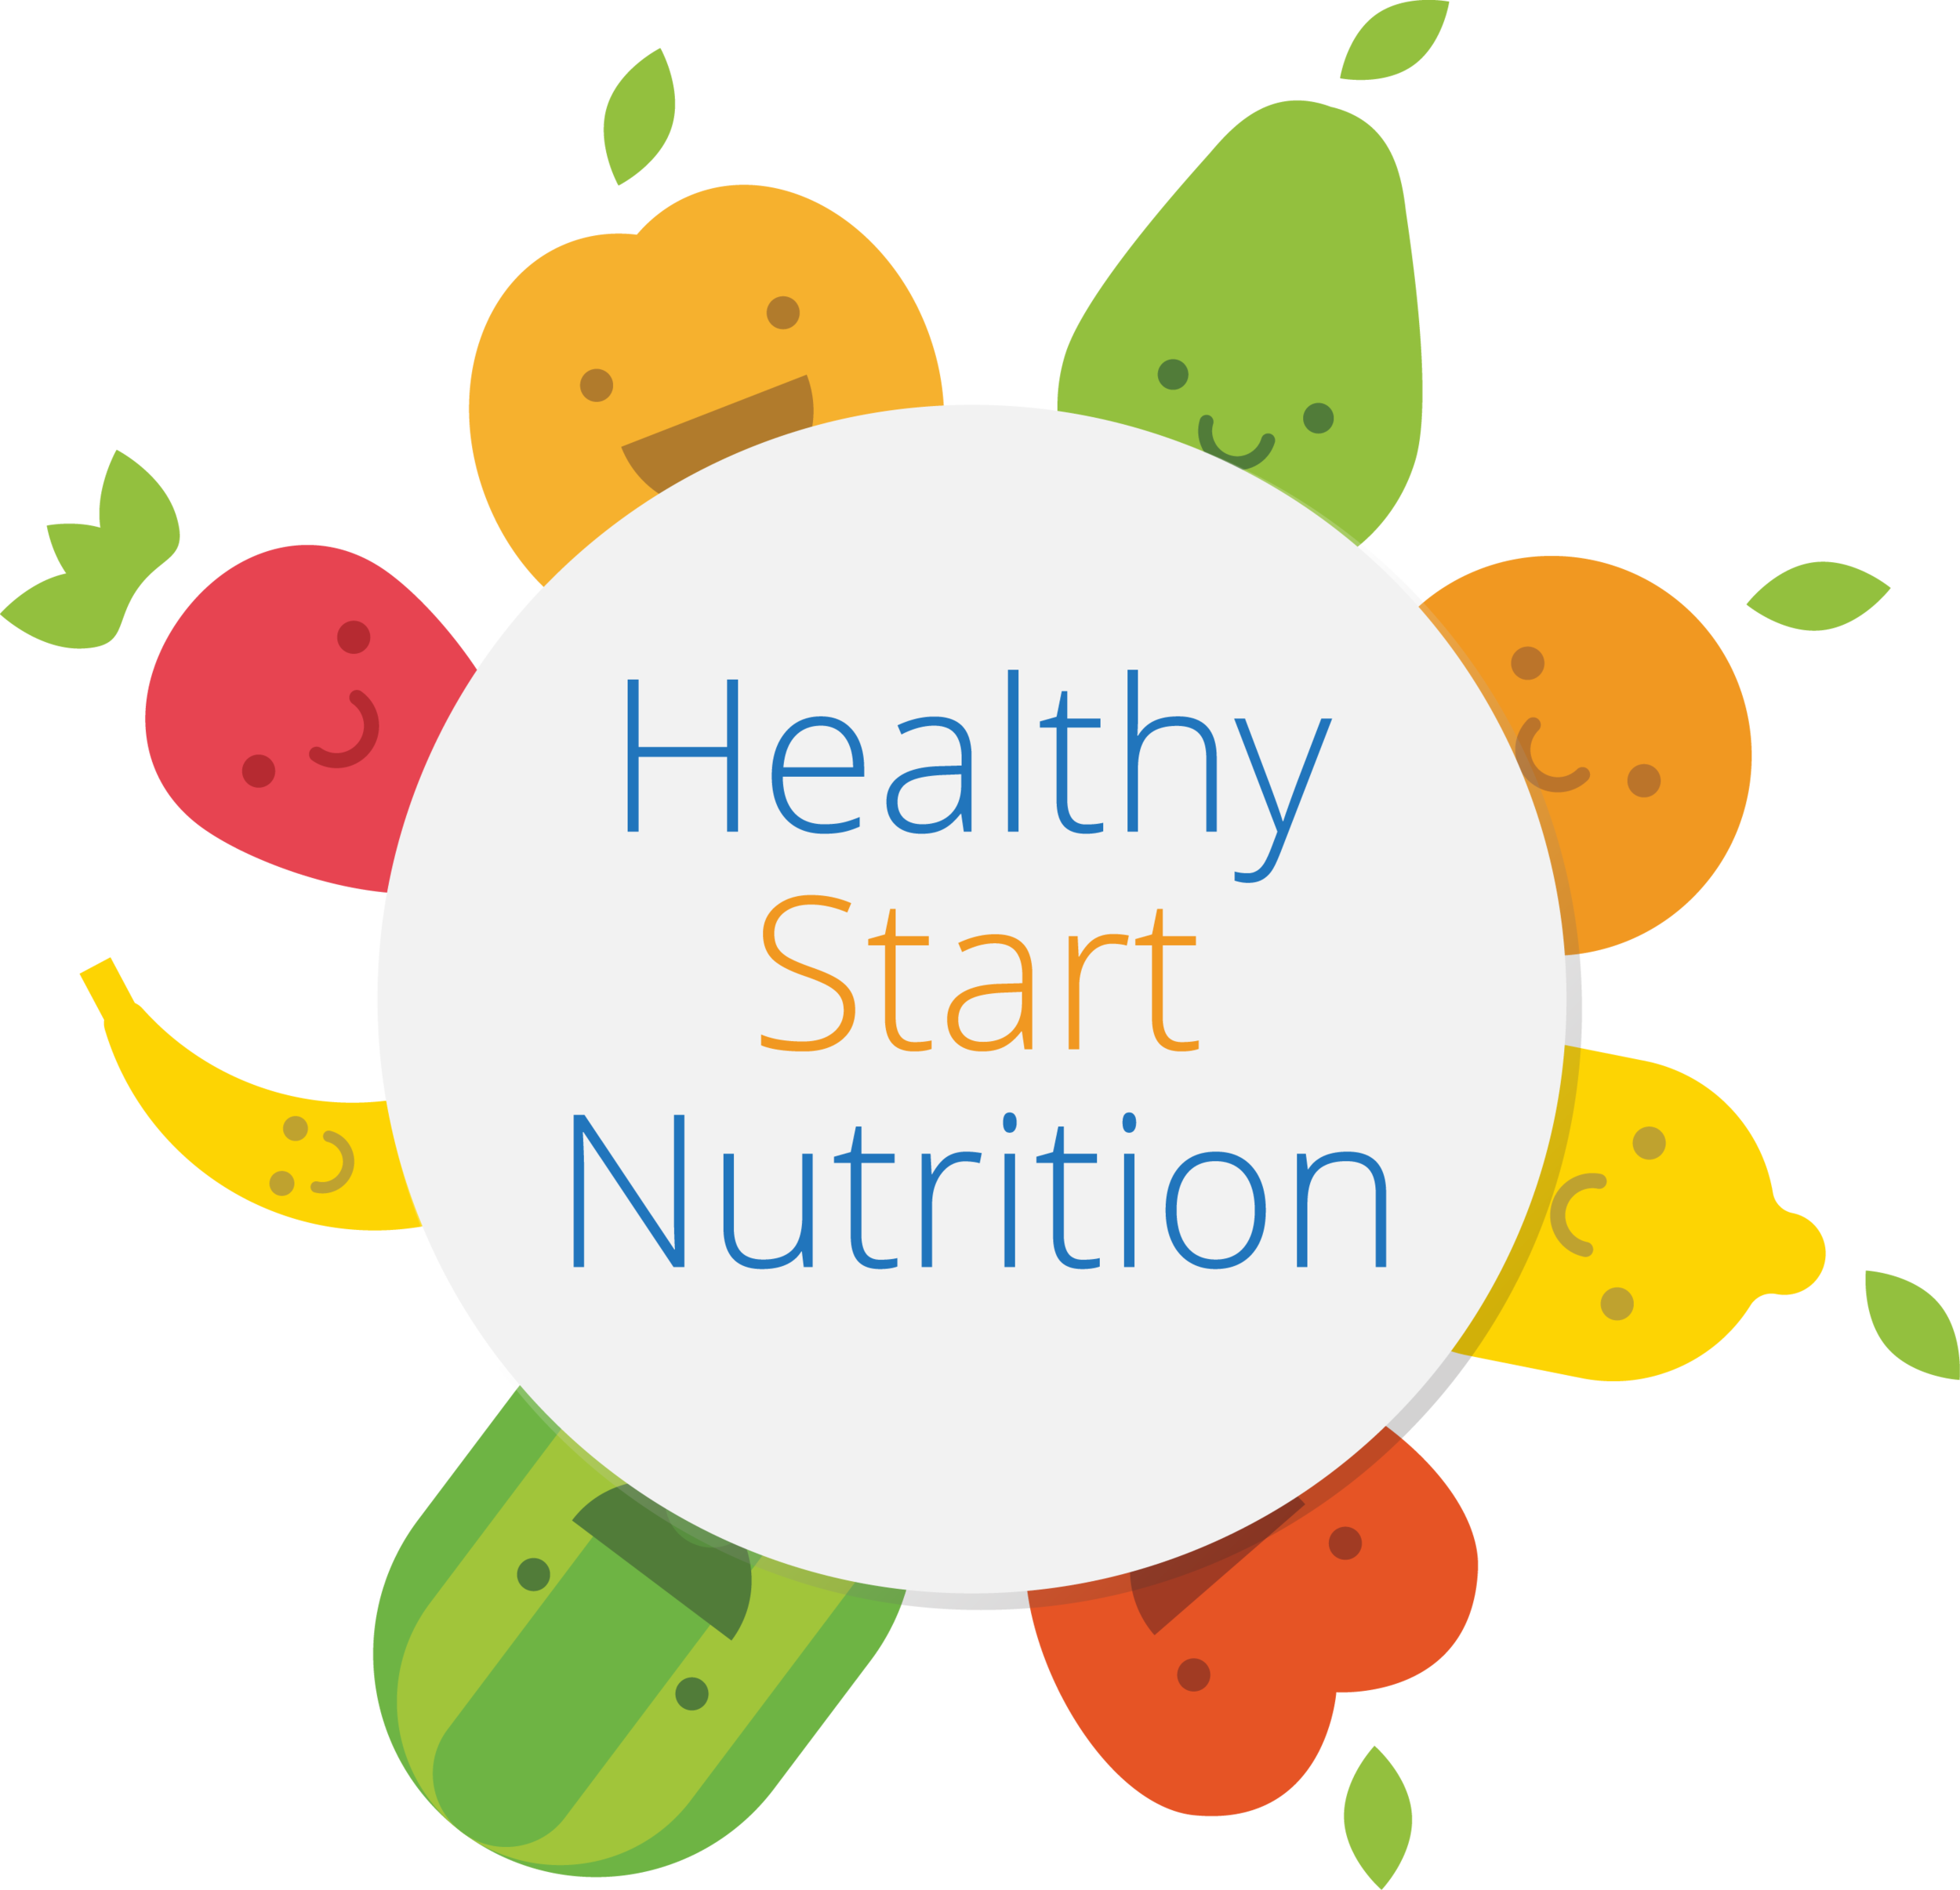 Healthy-Start-Nutrition